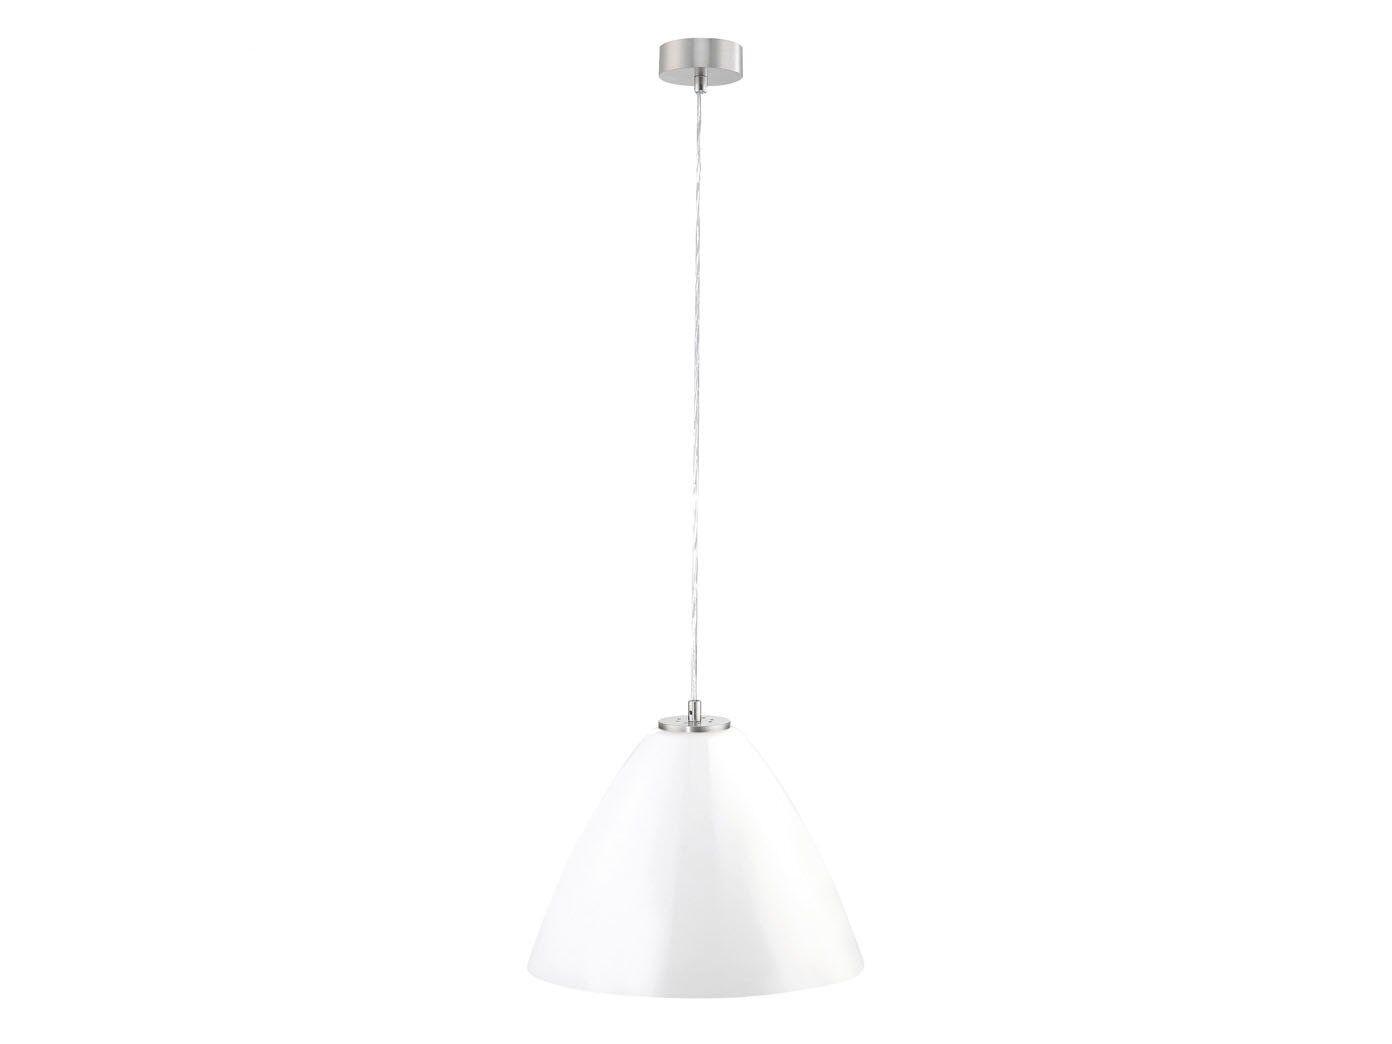 Suspendu Lampe suspendue Lampe Pendule Lampe De e27 Cuisine Pendule Verre Opal Brillant e27 De b234b2